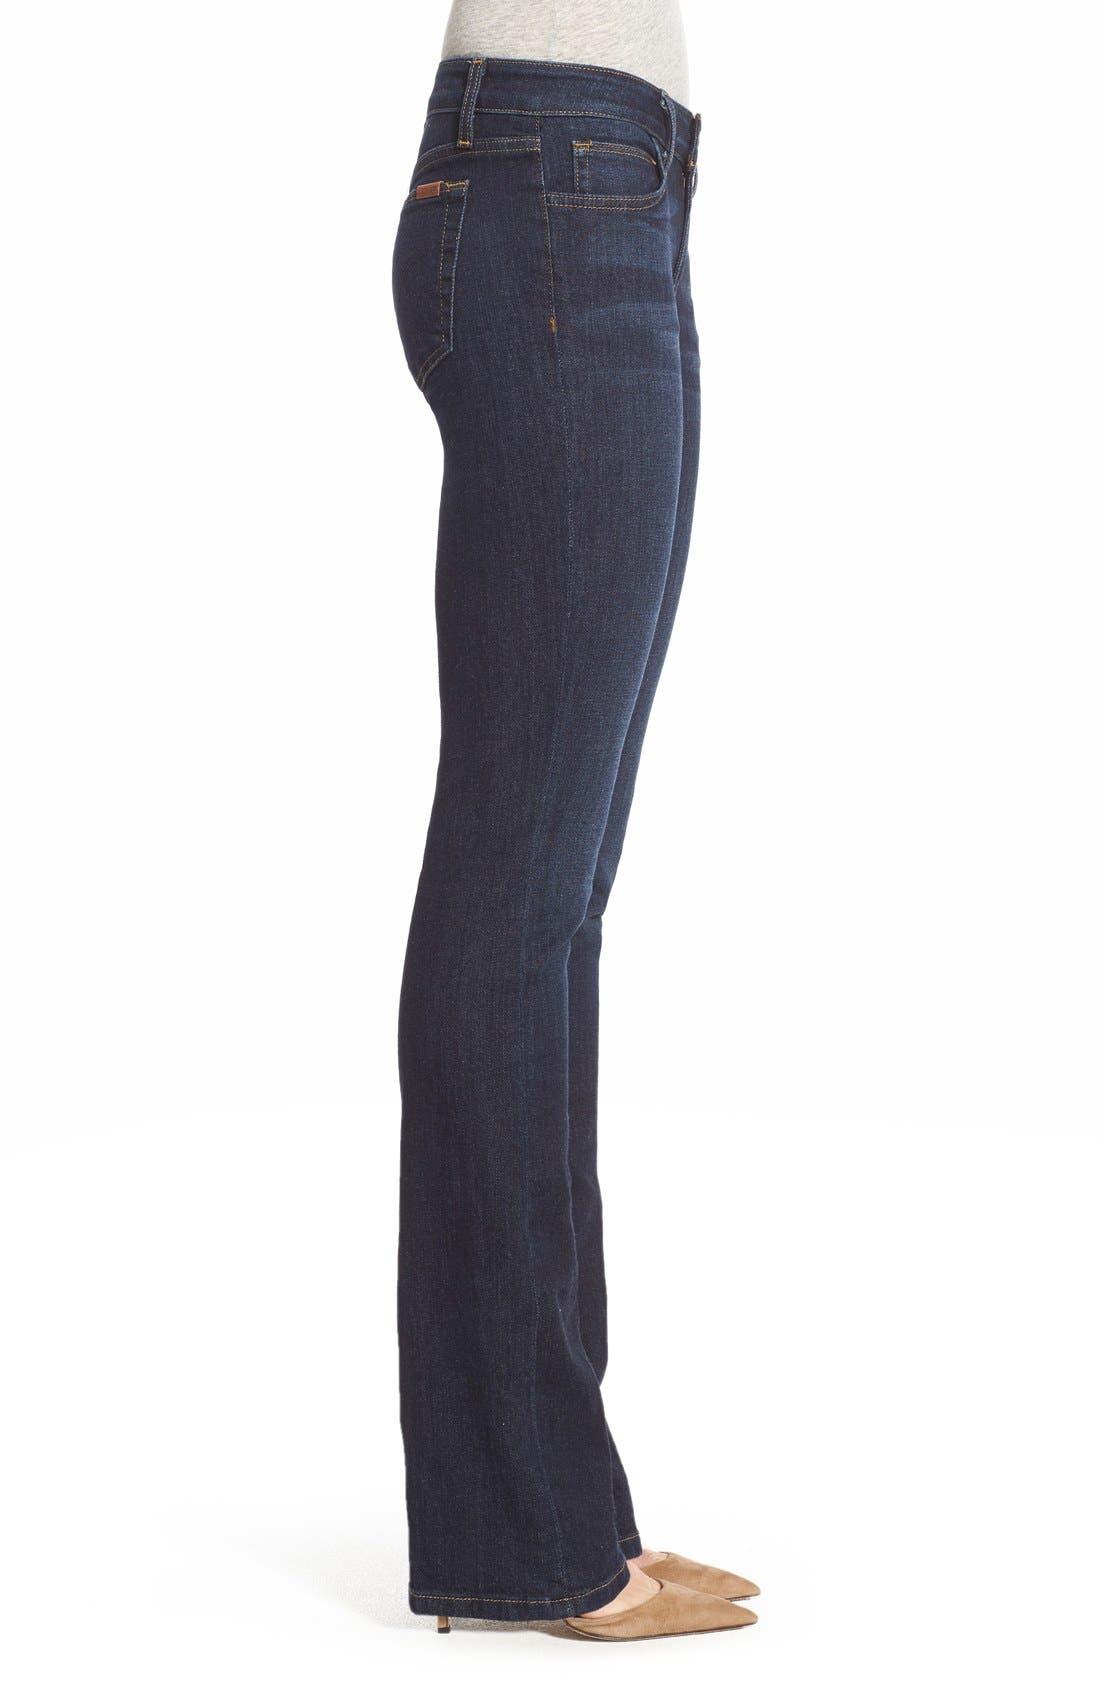 Alternate Image 3  - Joe's Honey Curvy Bootcut Jeans (Rikki)